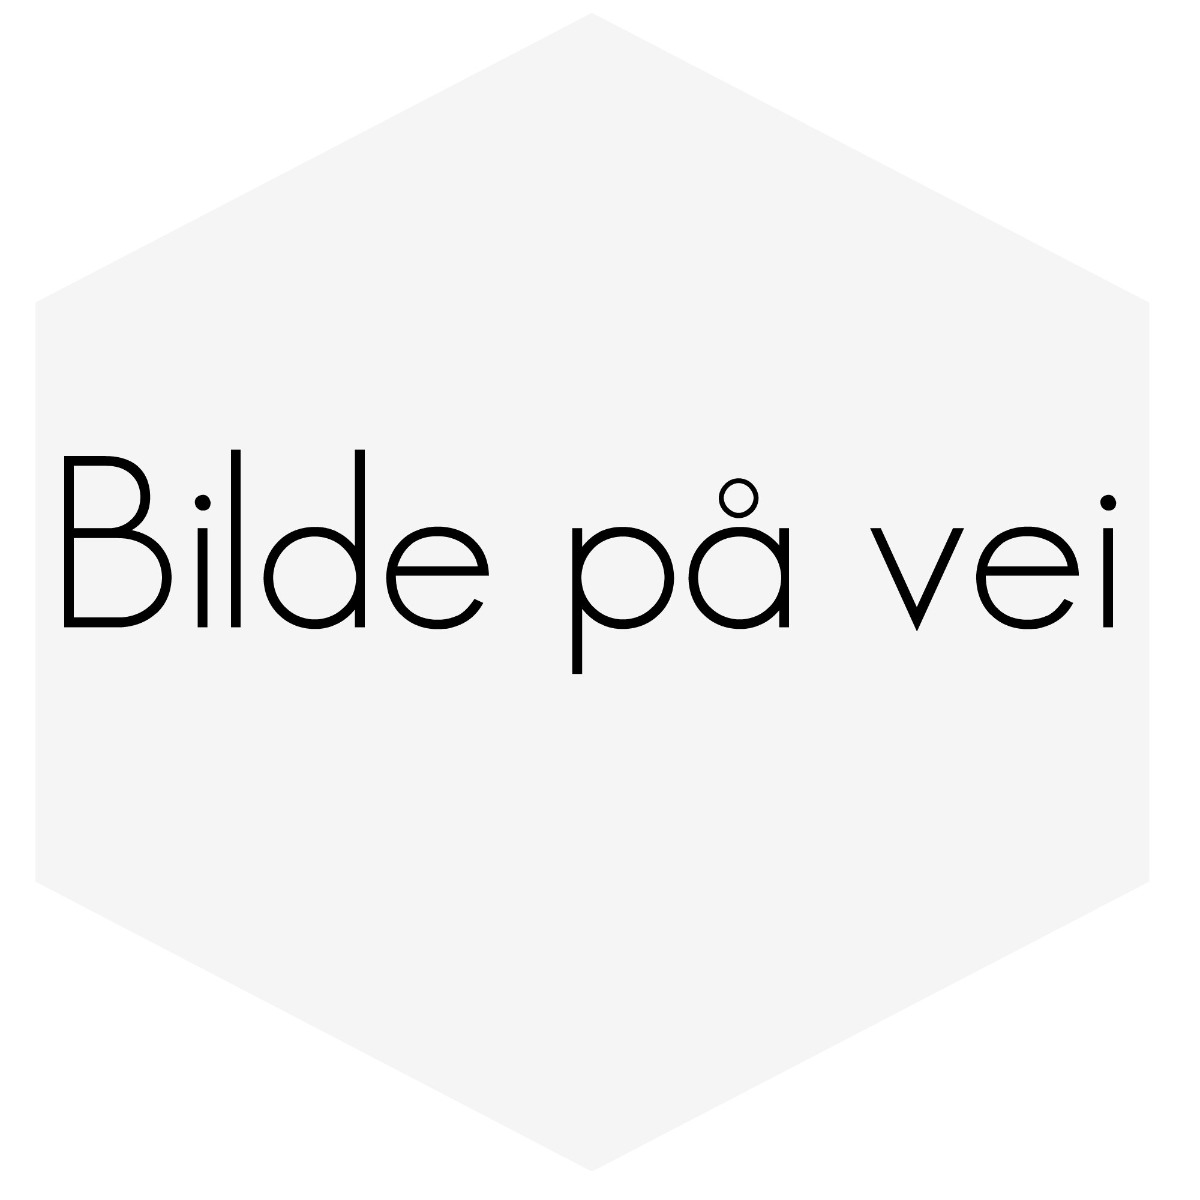 RELLE INNSPRUT 850-91-94  RØD TYPE  9434225  LIK 10.9591